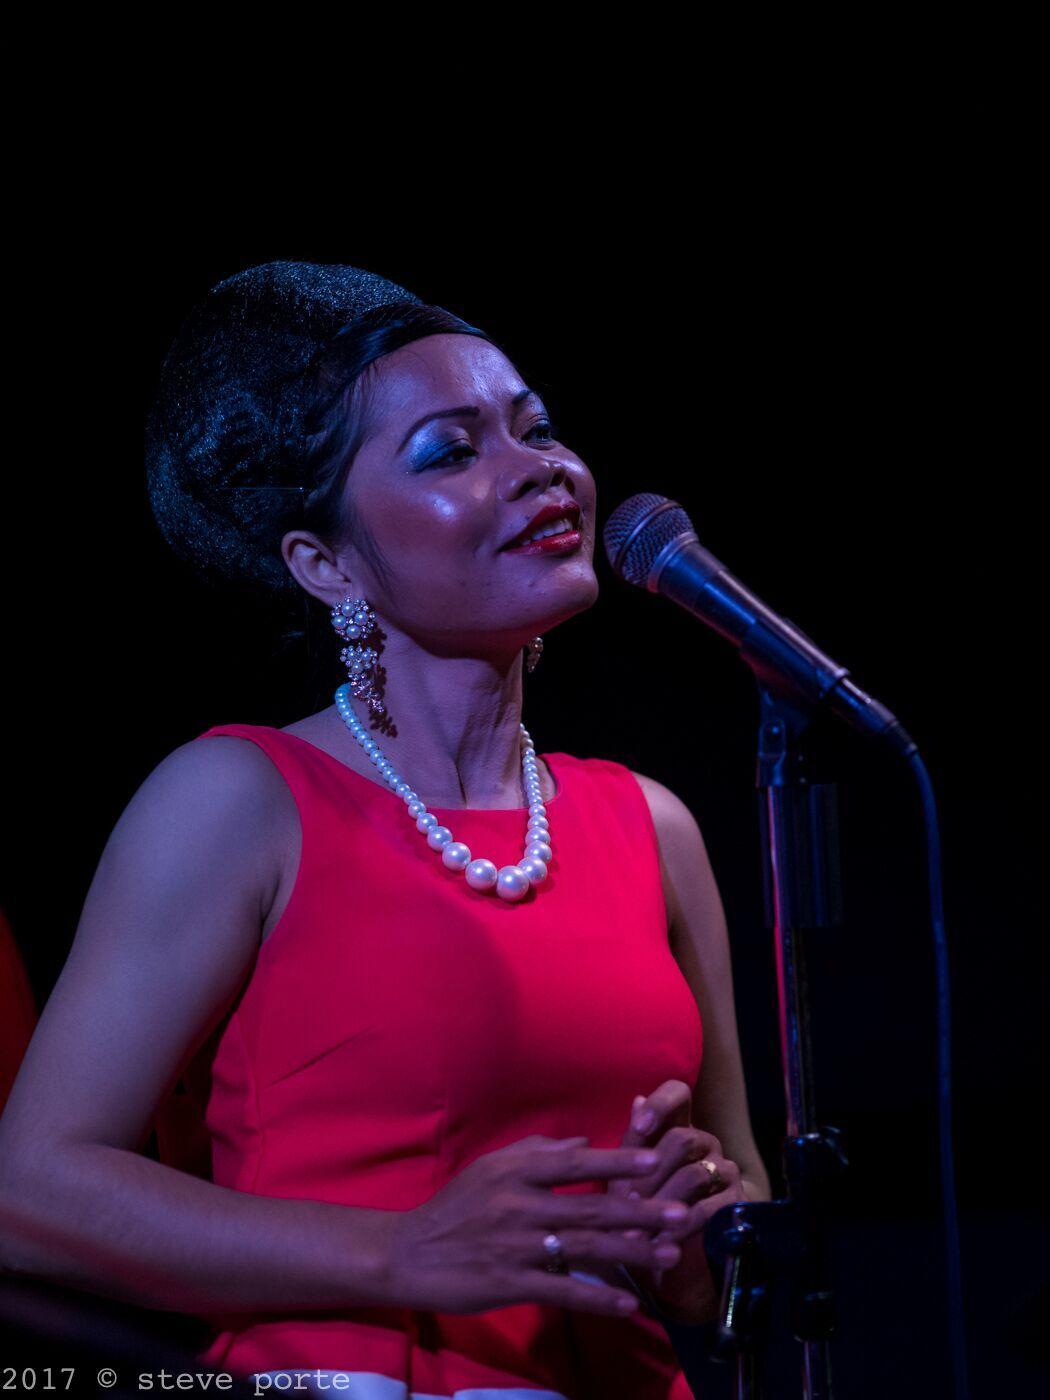 Miss Sarawan Jazz Club Phnom Penh Cambodia